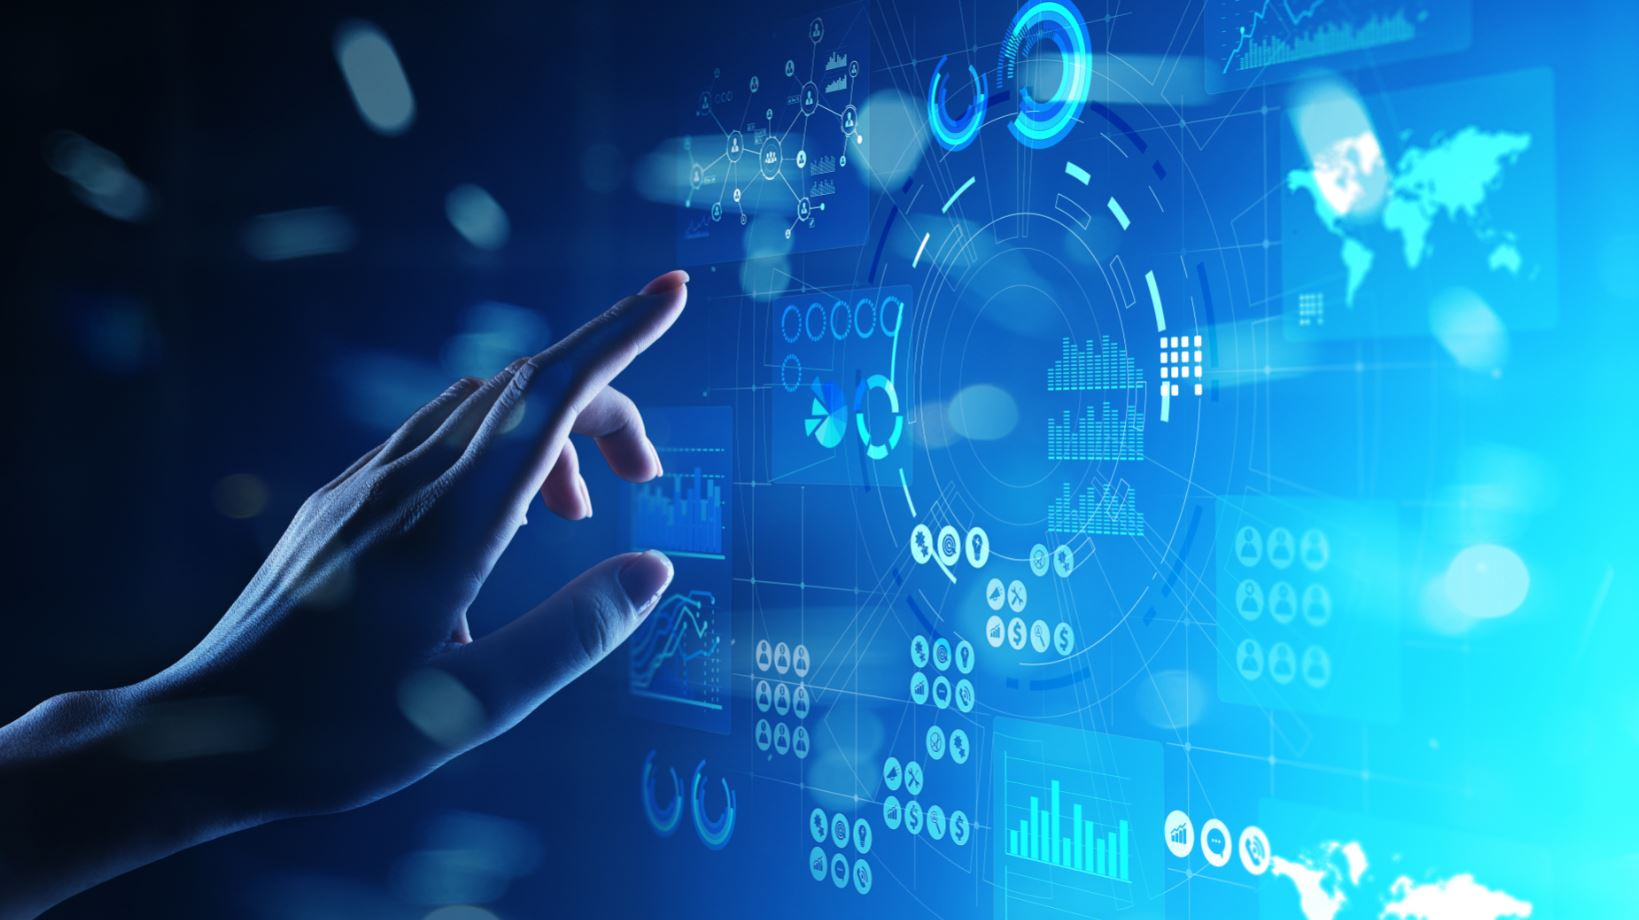 BI Materials Outlook: NexantECA & Bloomberg Intelligence Experts Perspectives